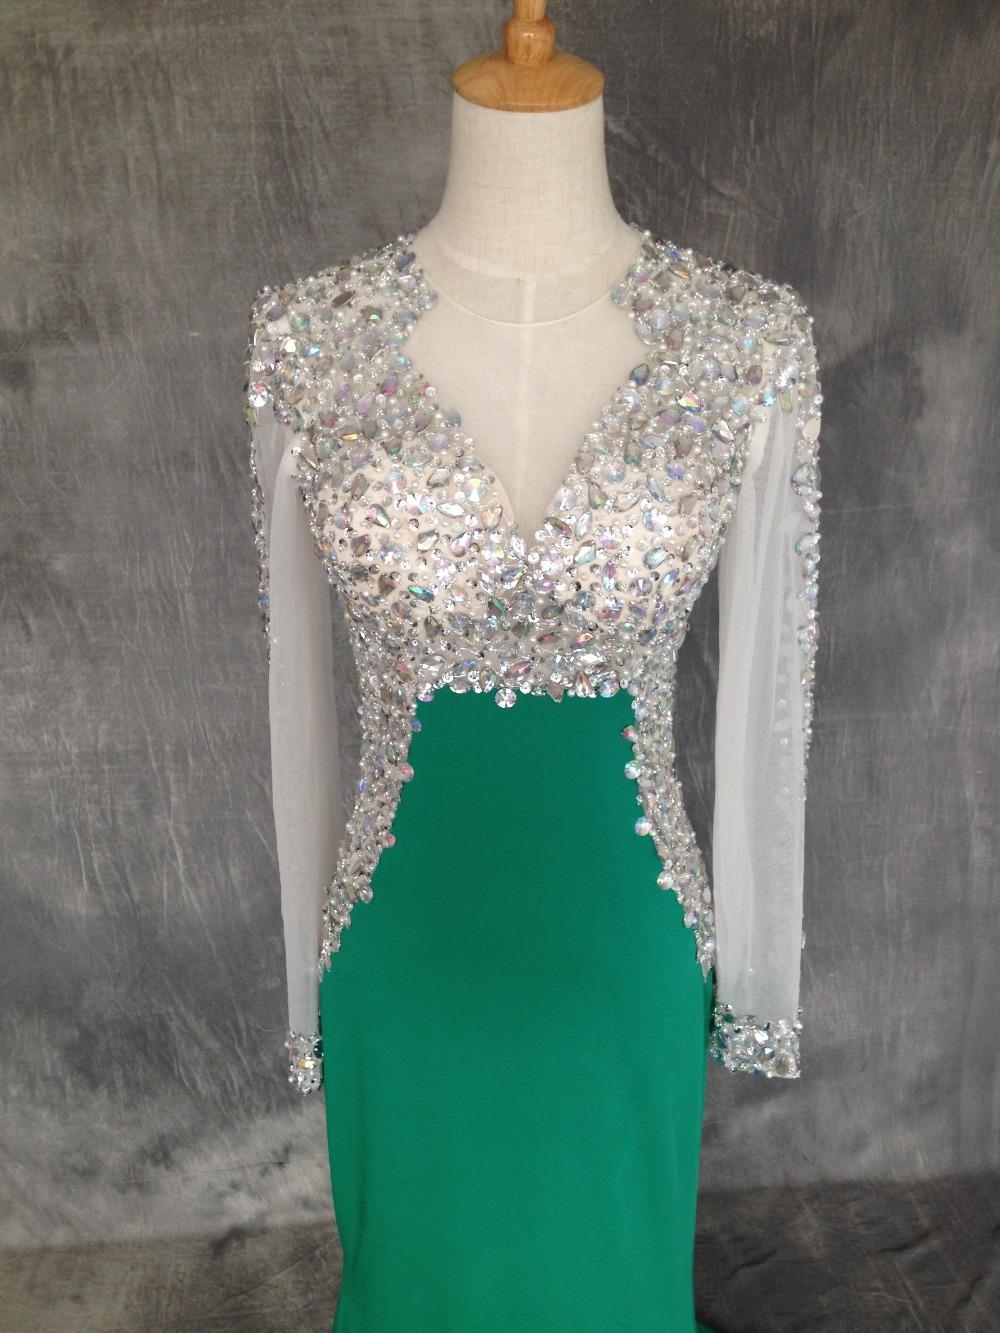 green vestido de formatura 2015 diamond prom dresses with